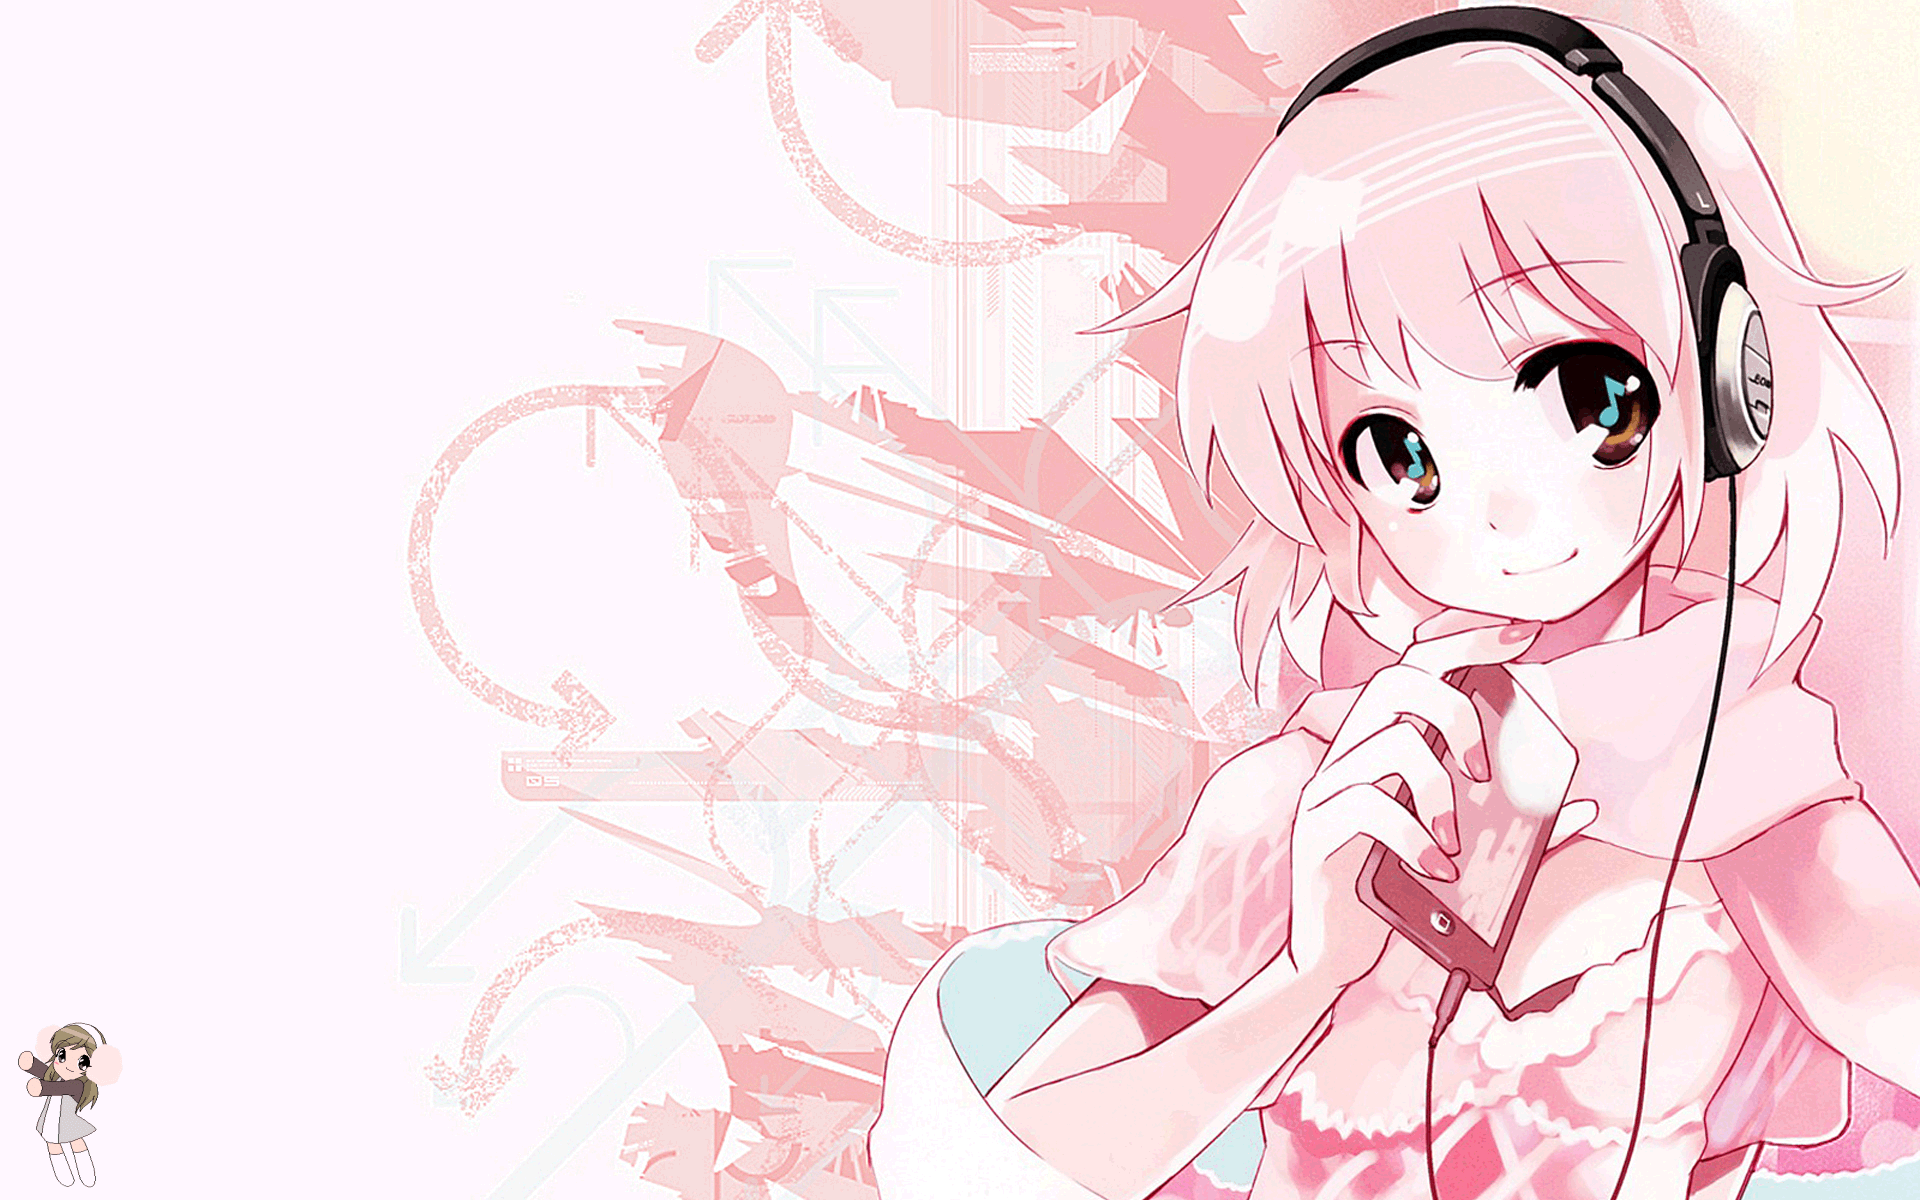 Pink Anime   Wallpaper 37413 1920x1200